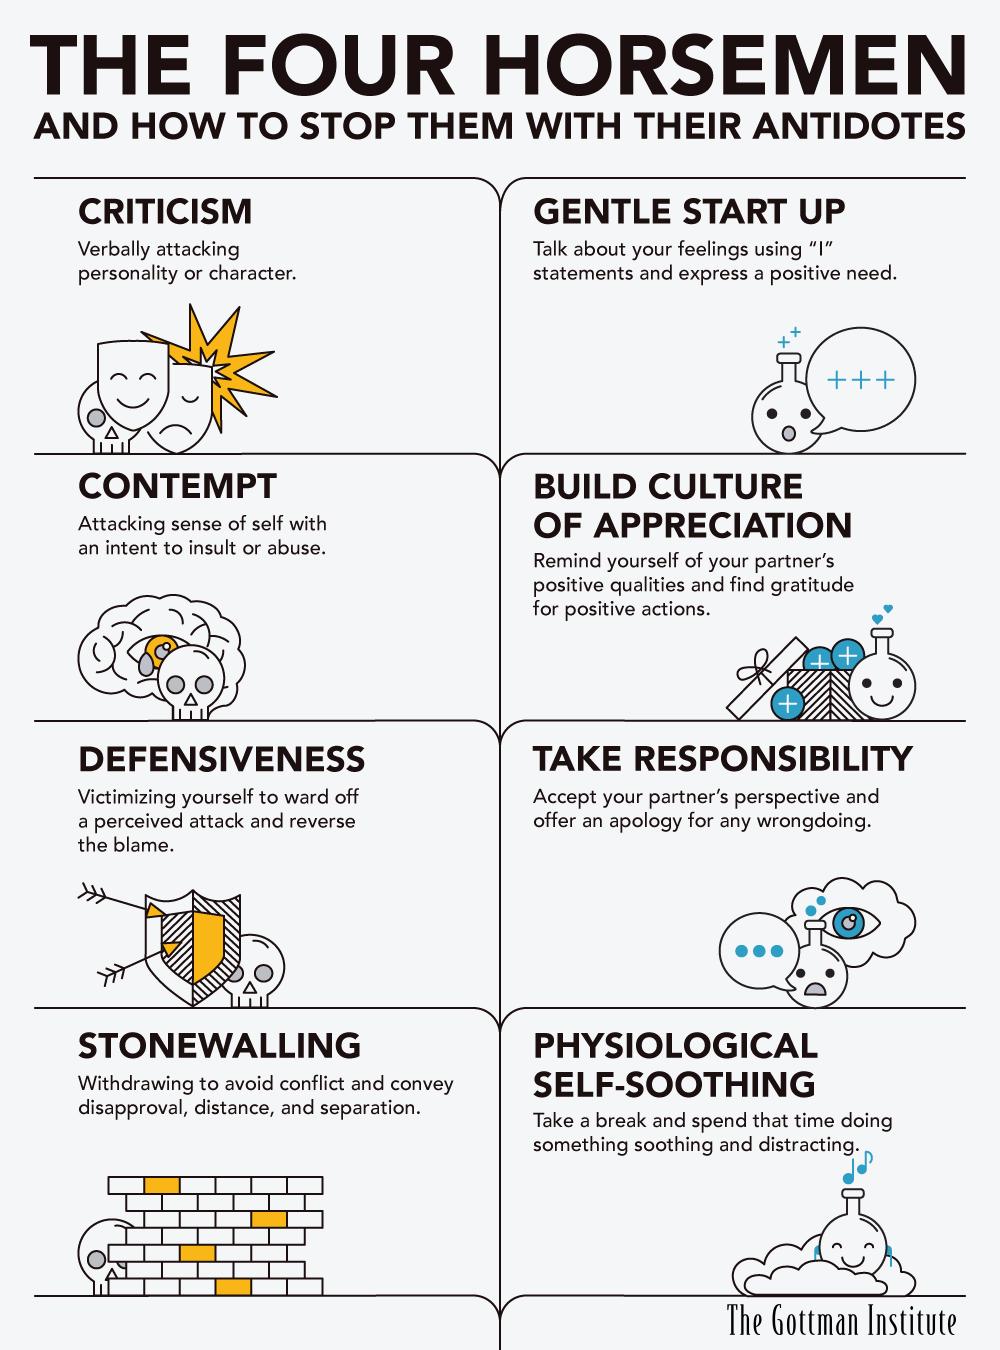 The Four Horsemen Criticism, Contempt, Defensiveness, and